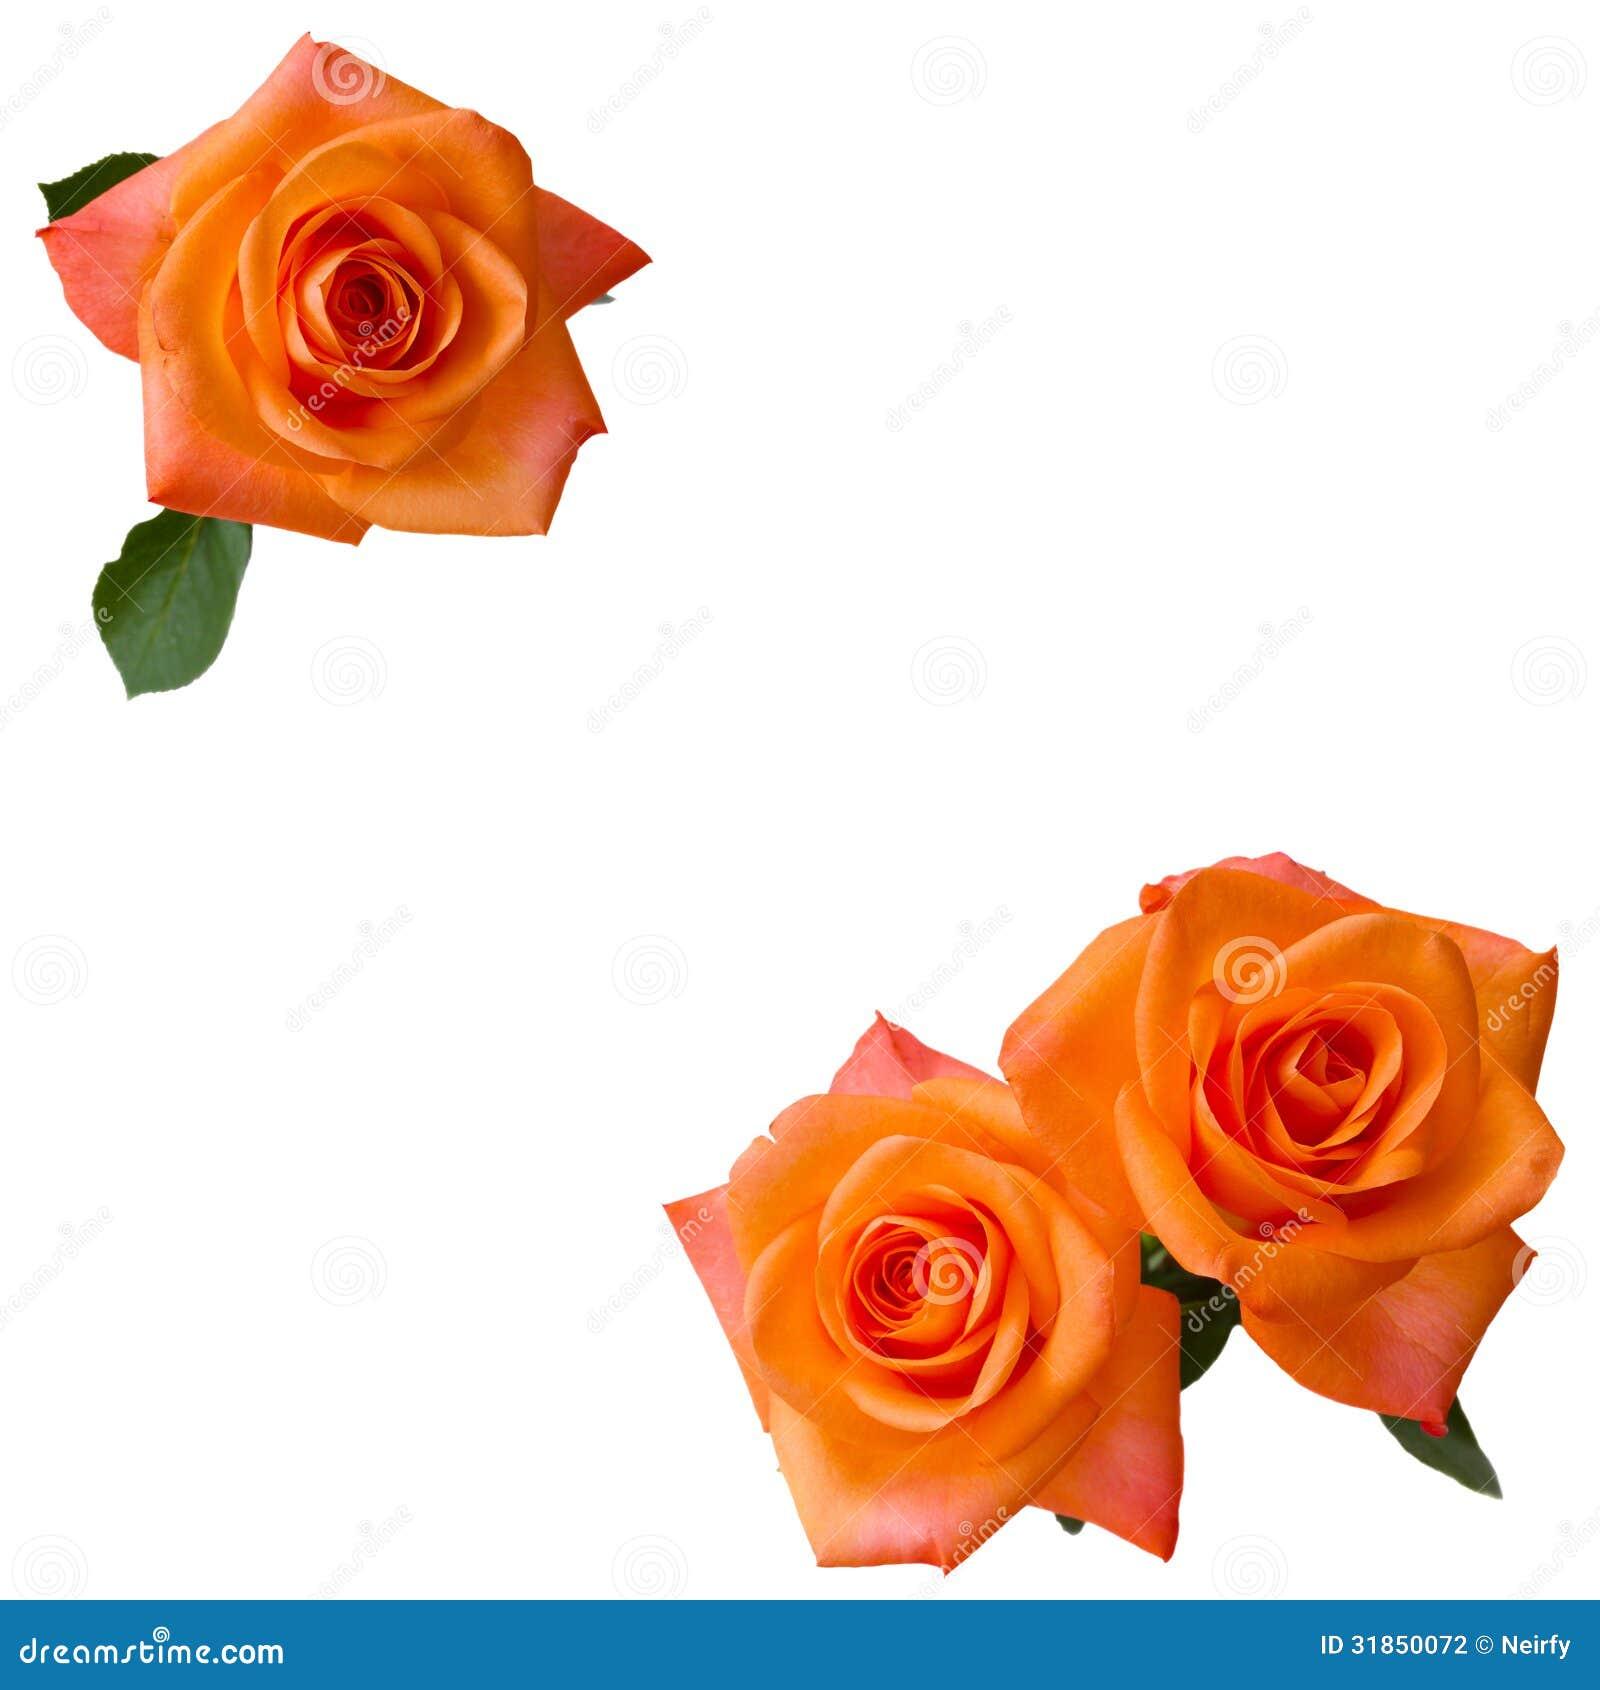 drei orange rosen stockfotografie bild 31850072. Black Bedroom Furniture Sets. Home Design Ideas